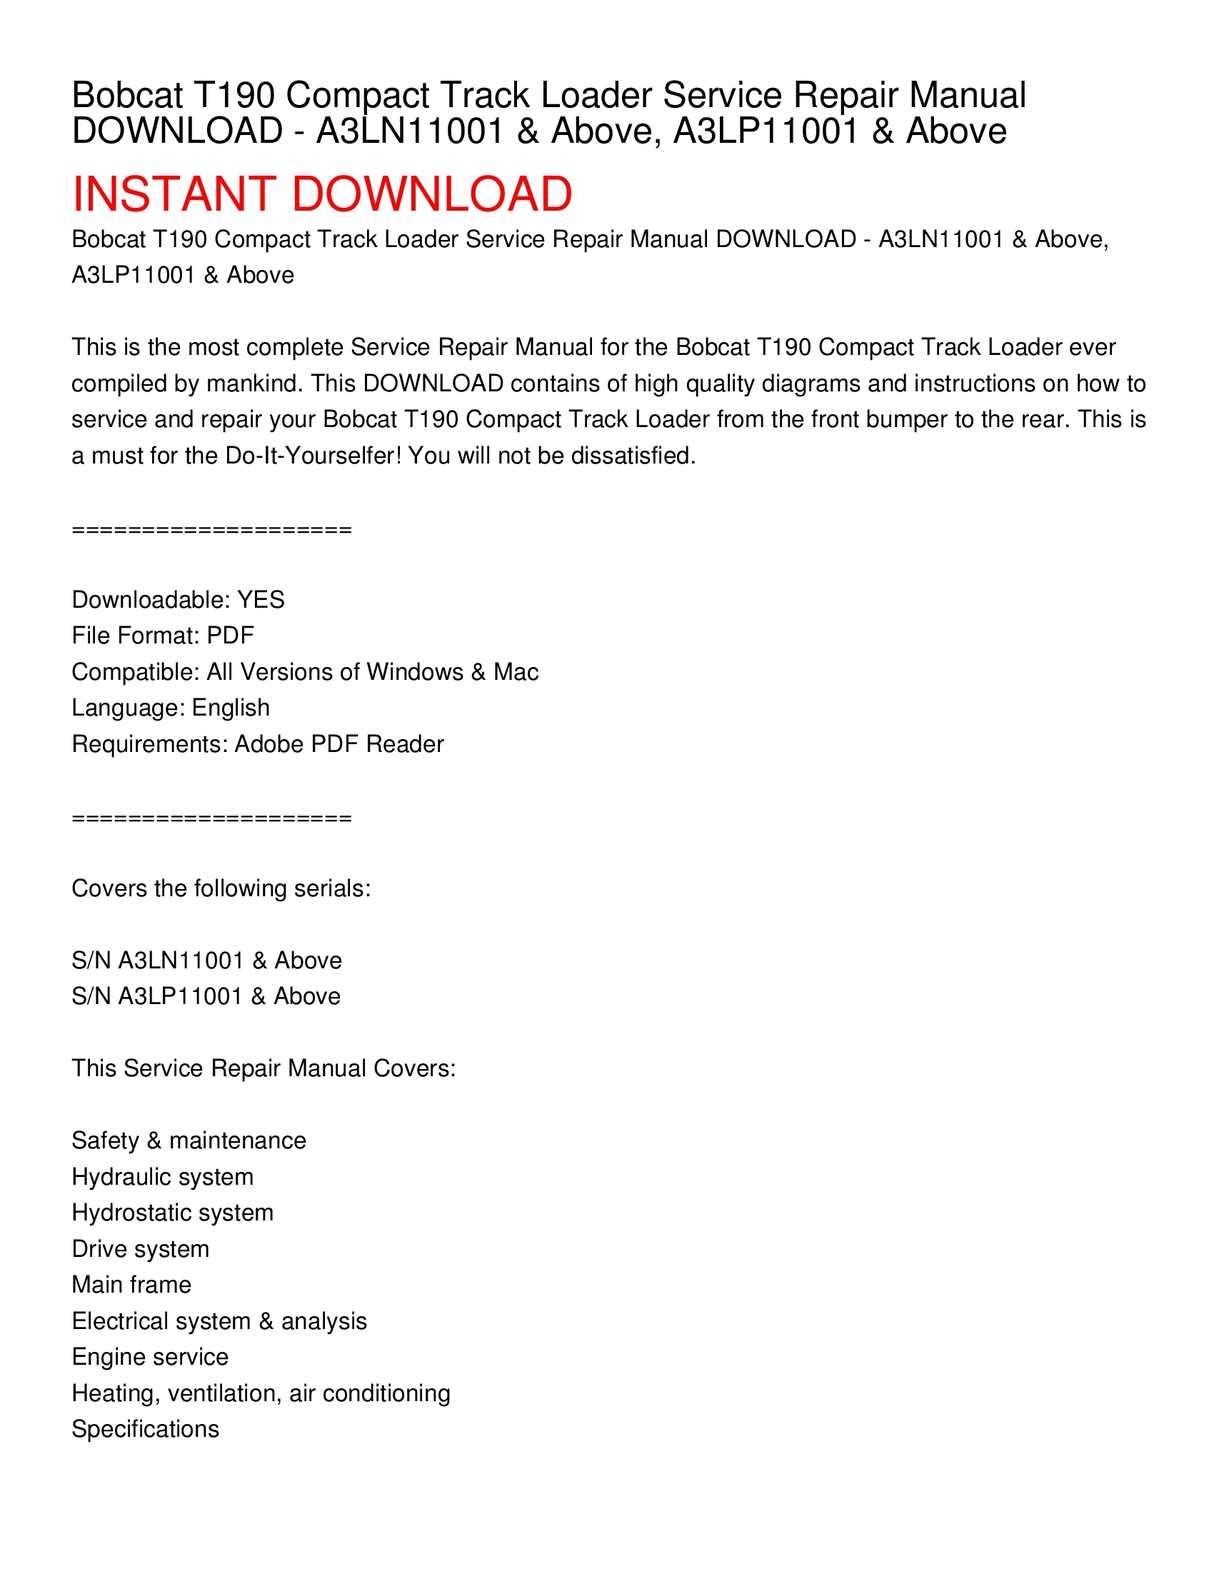 bobcat t190 compact track loader service repair manual download - a3ln11001  & above, a3lp11001 & above